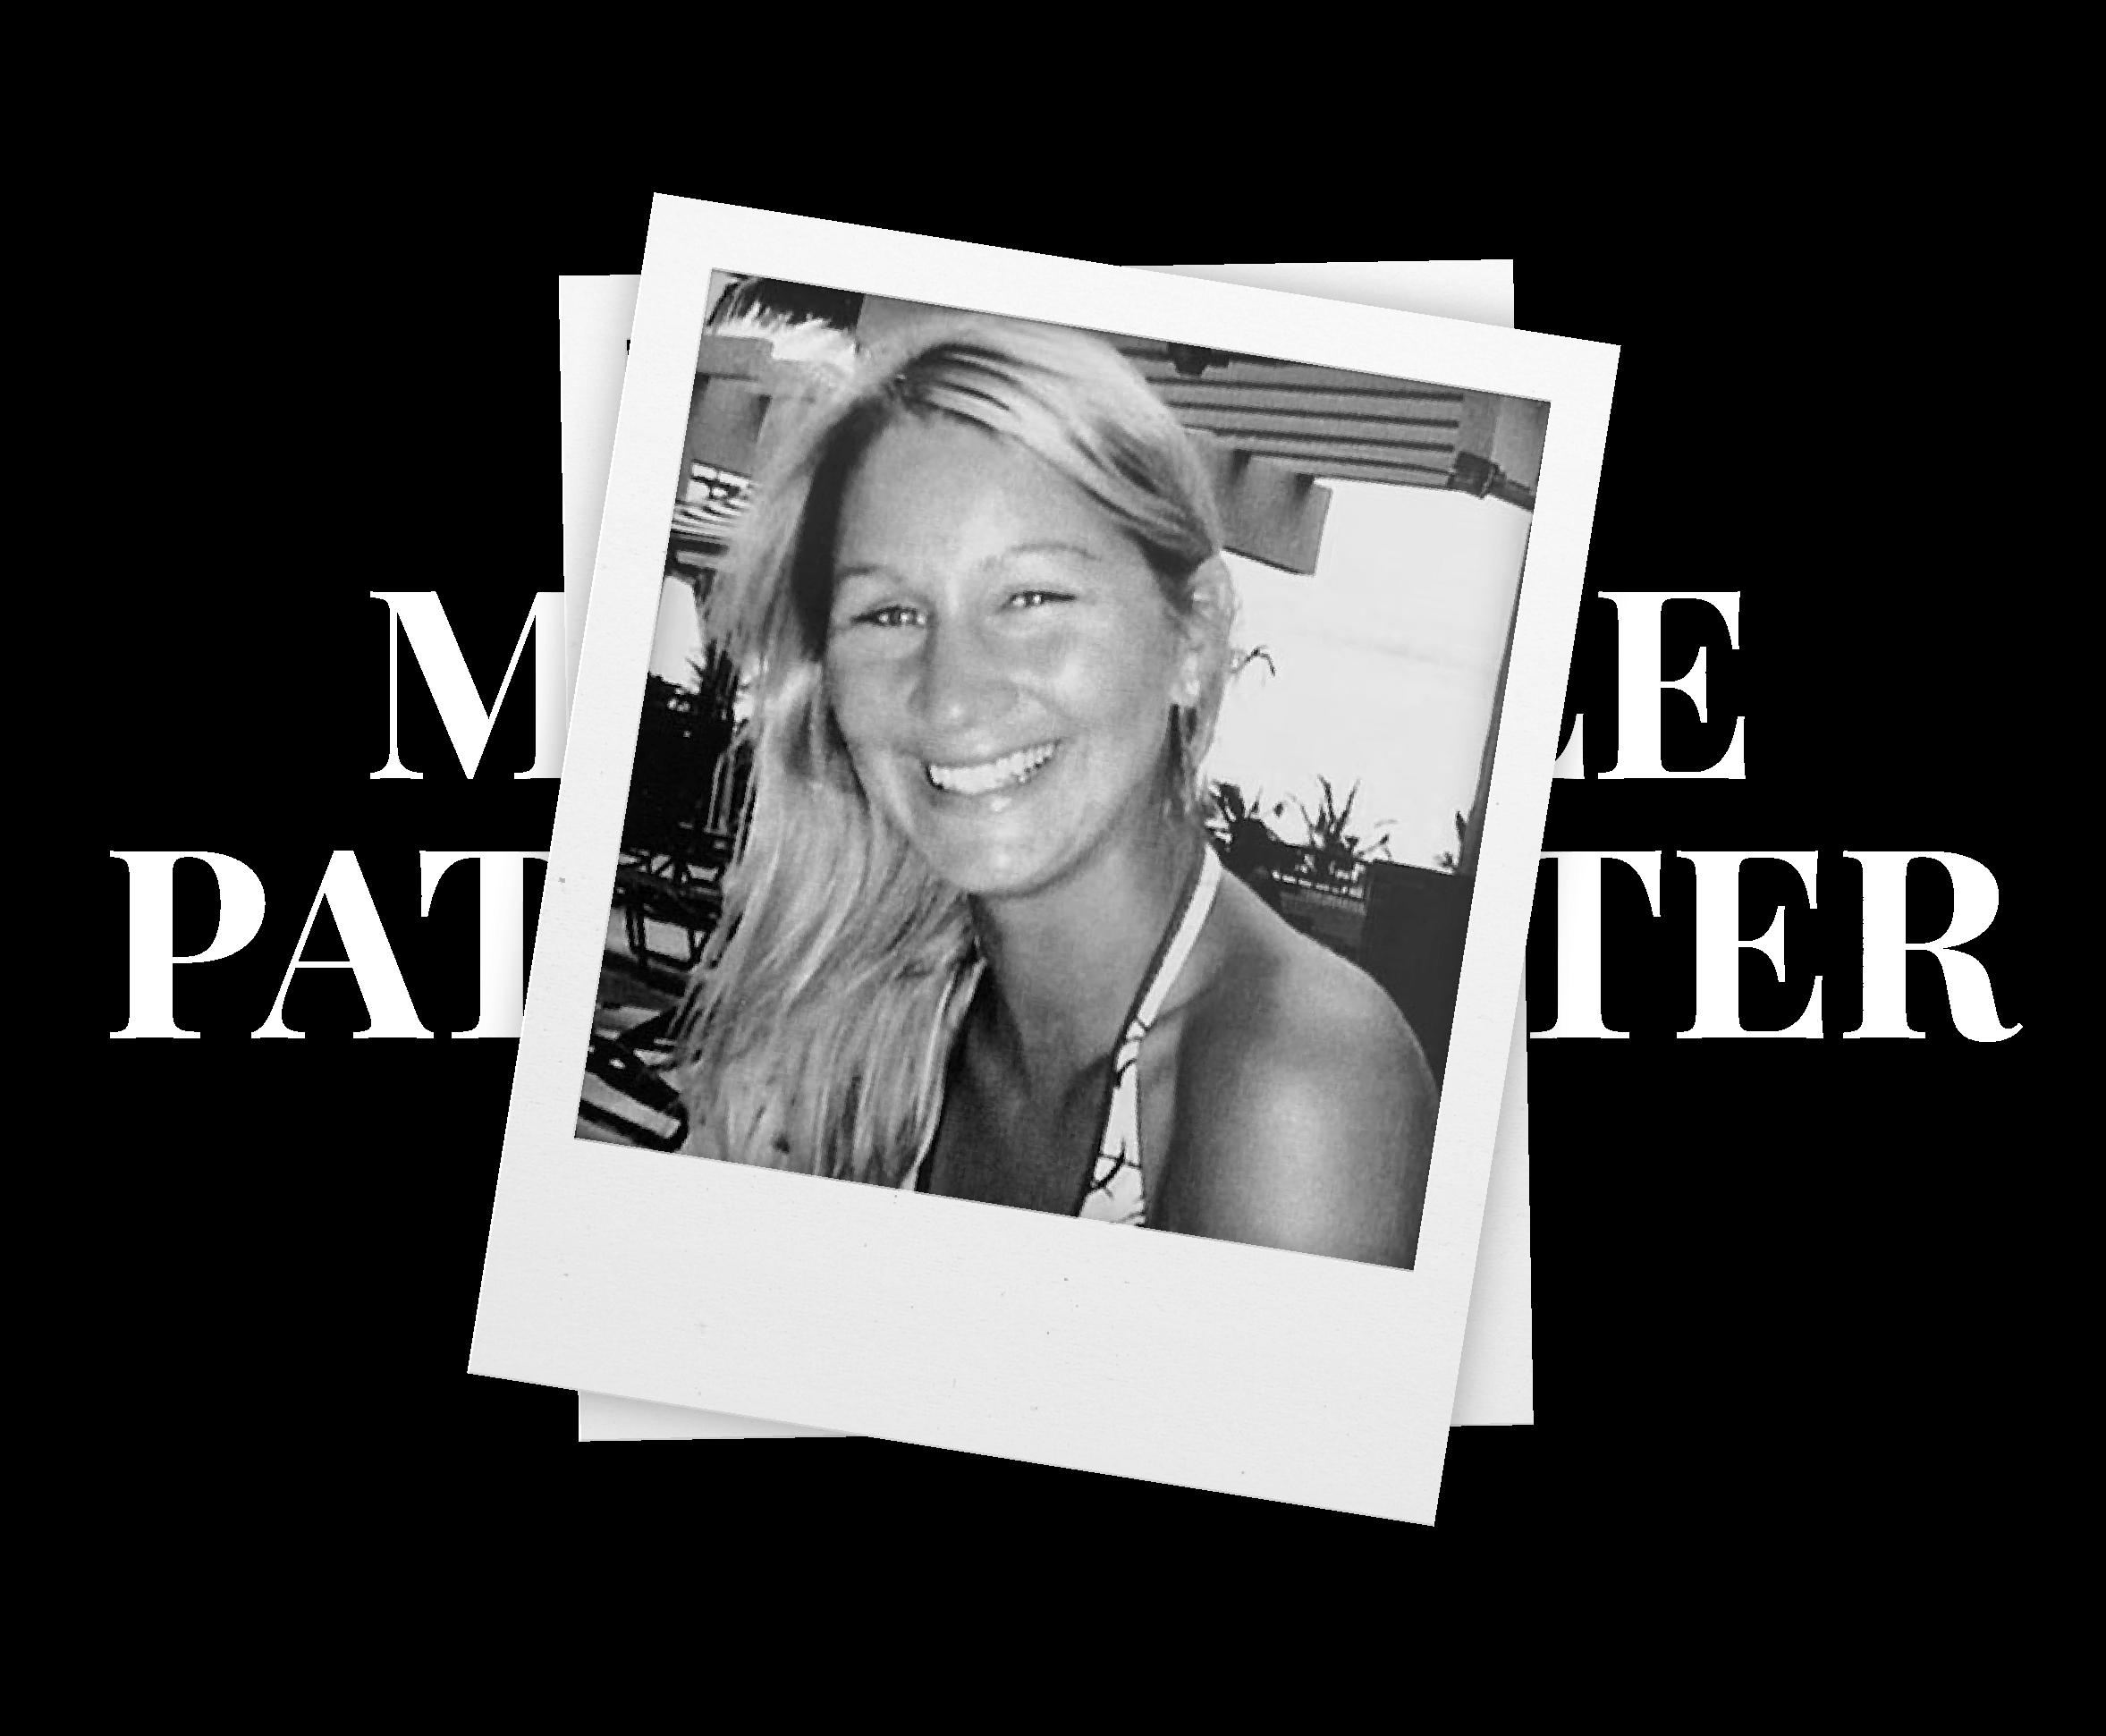 Michelle Paternoster